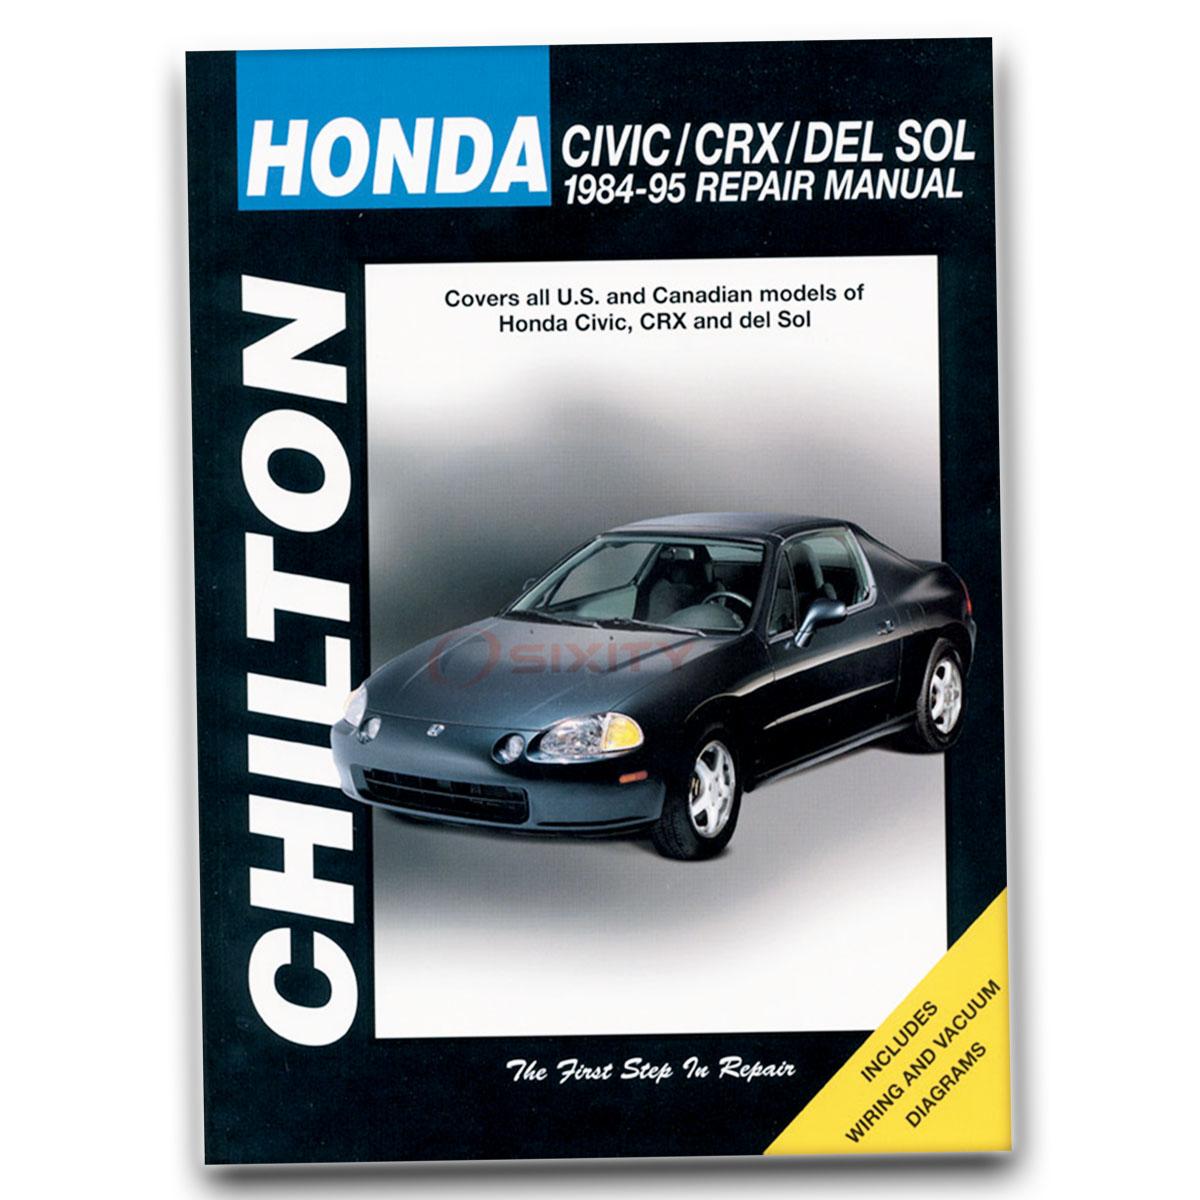 honda crx chilton repair manual base si hf shop service garage book rh ebay com 1985 Honda CRX Si 1985 Honda CRX Si